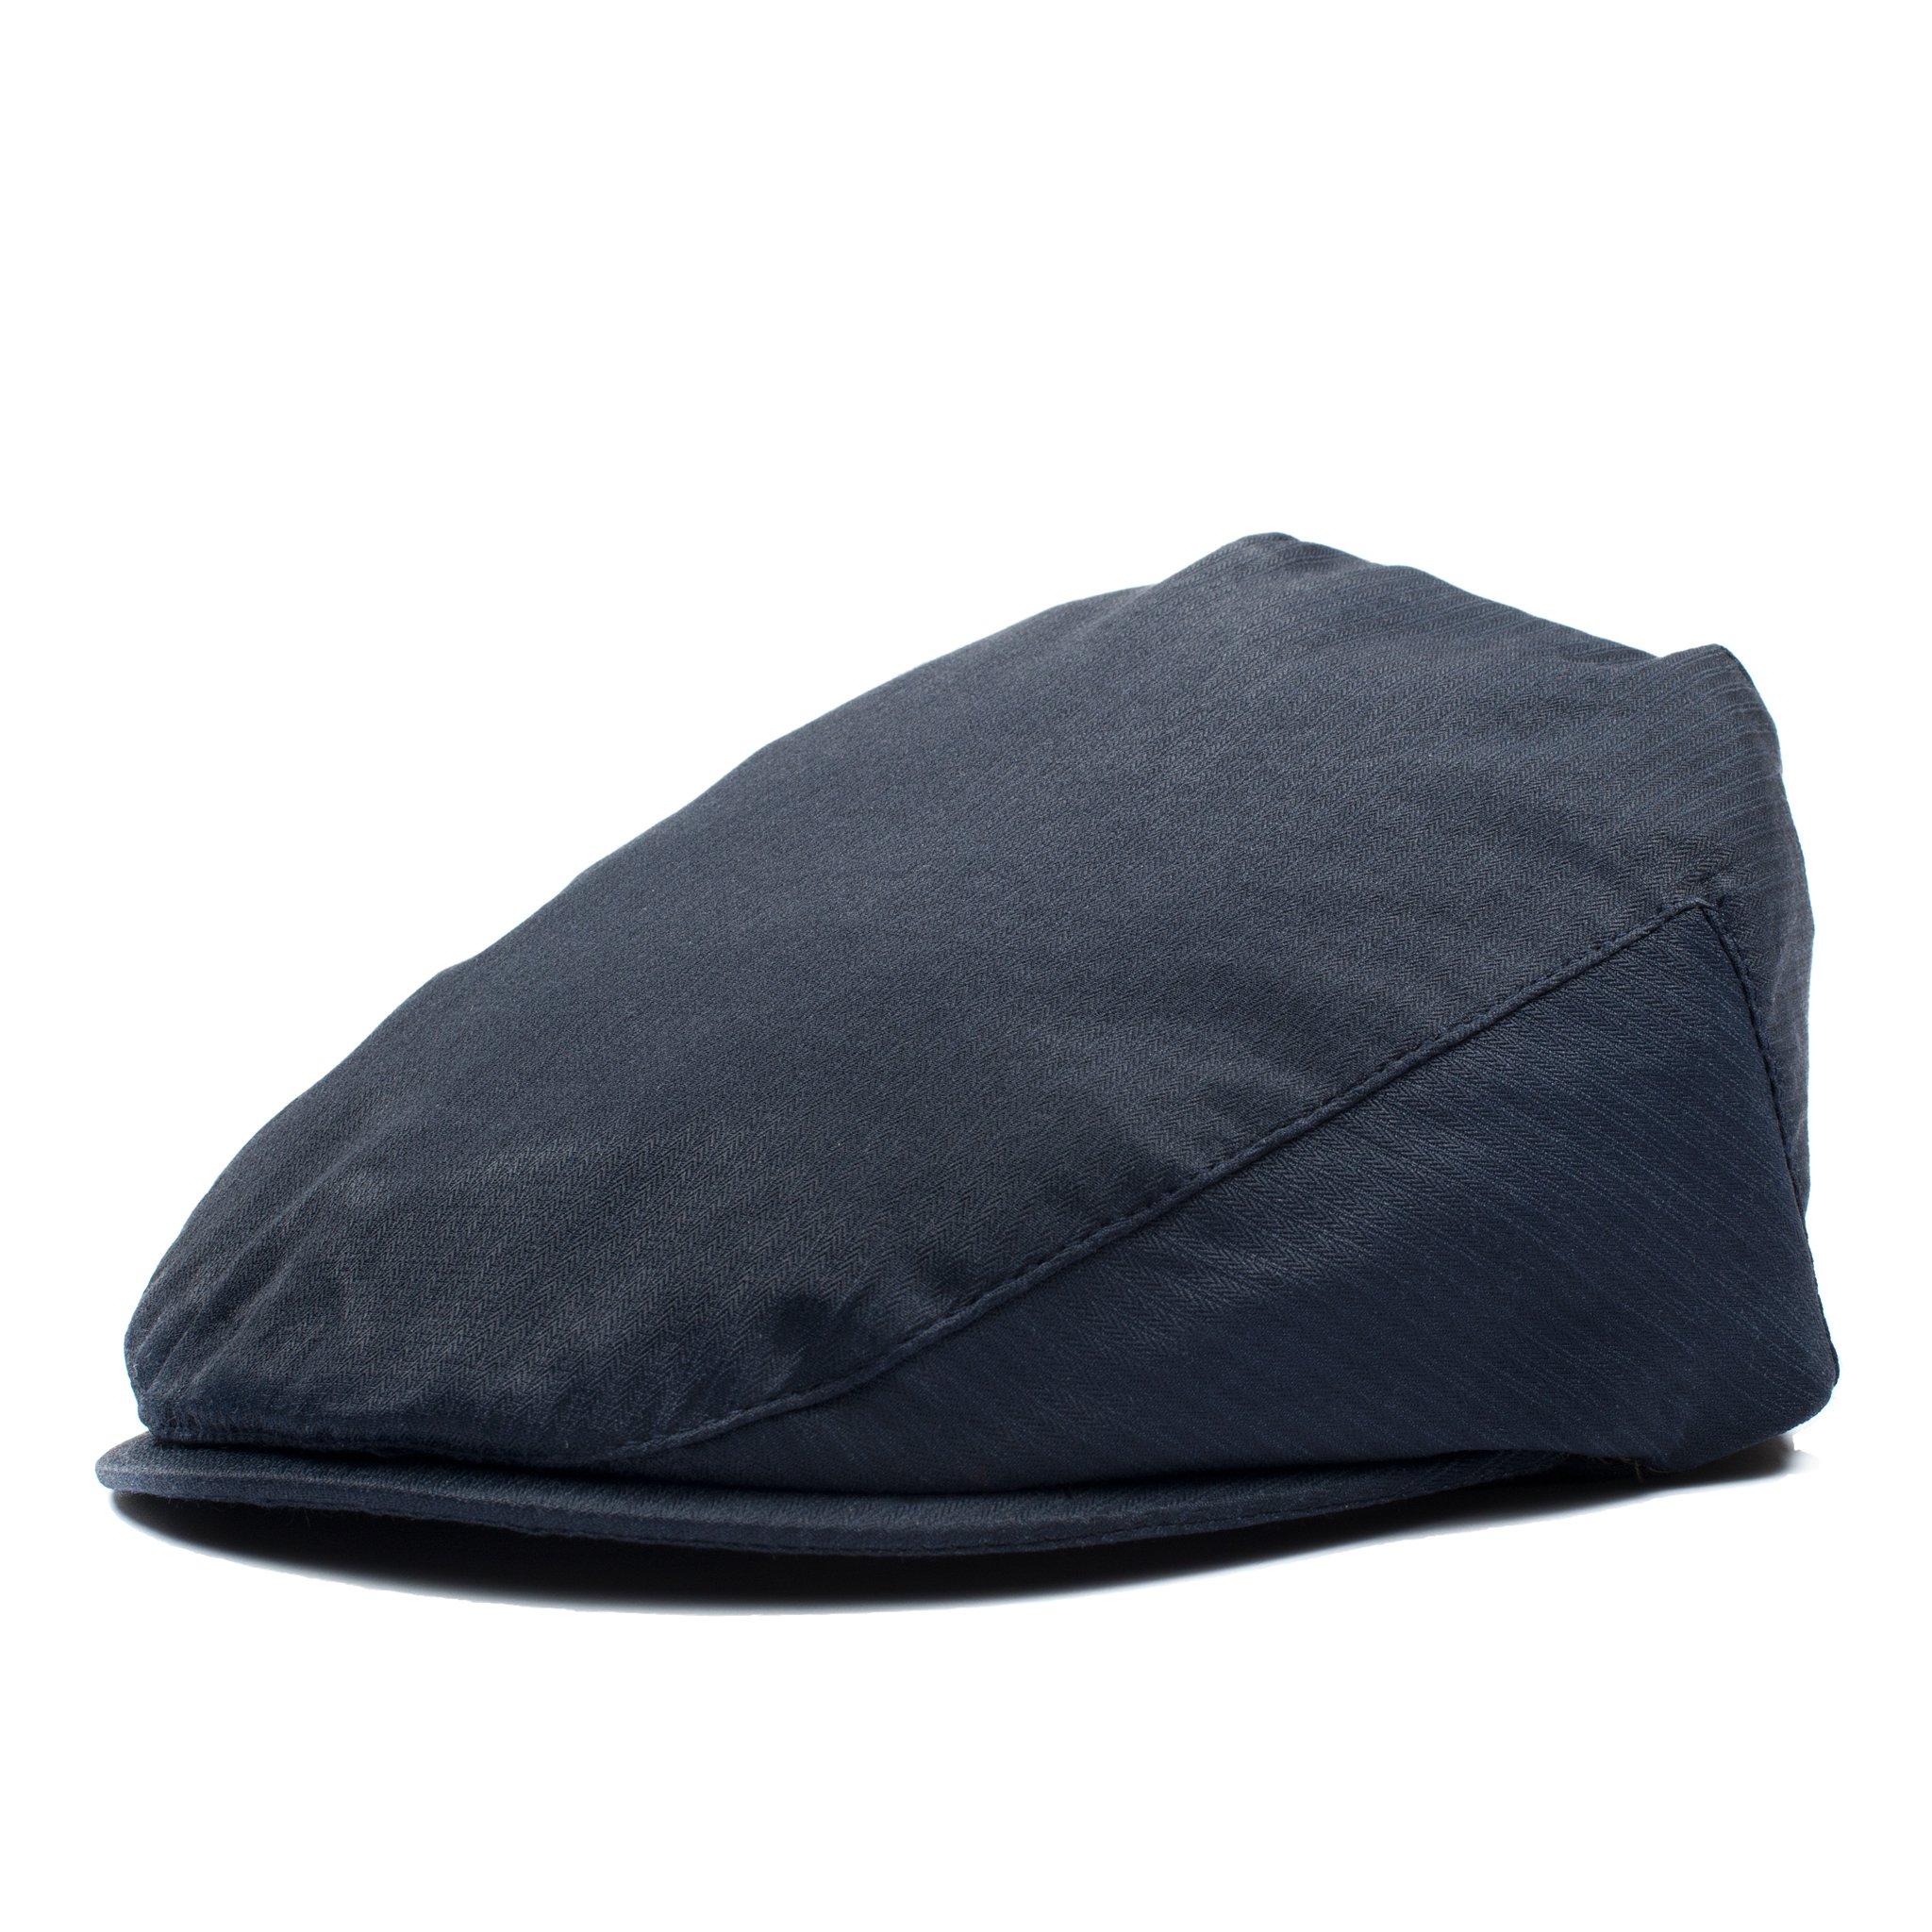 Born to Love Flat Scally Cap - Boy's Tweed Page Boy Newsboy Baby Kids Driver Cap Hat (XXS (6-12 Months 46CM), Navy)